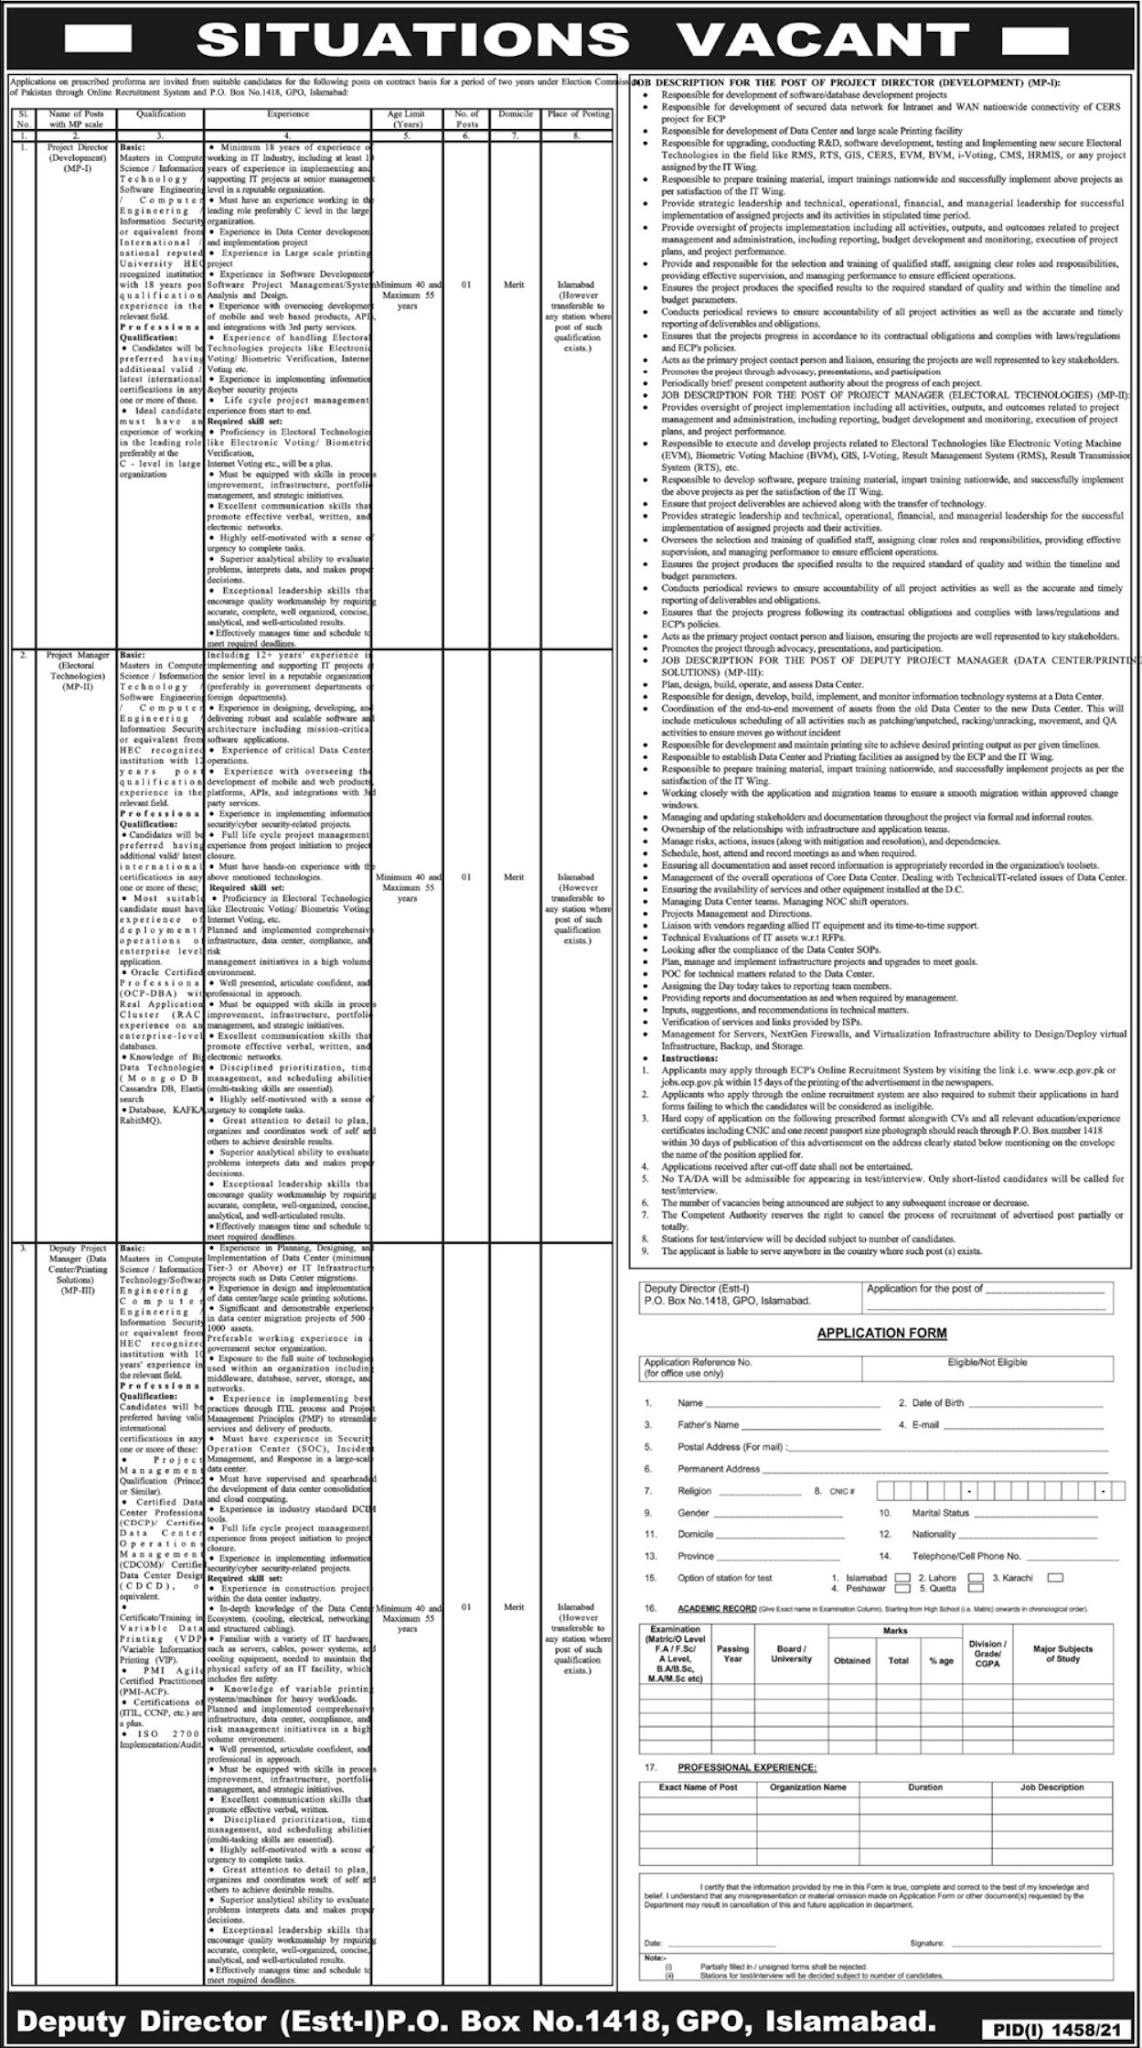 Latest Public Sector Organization PO Box No 1418 GPO Islamabad Jobs Opportunities 2021